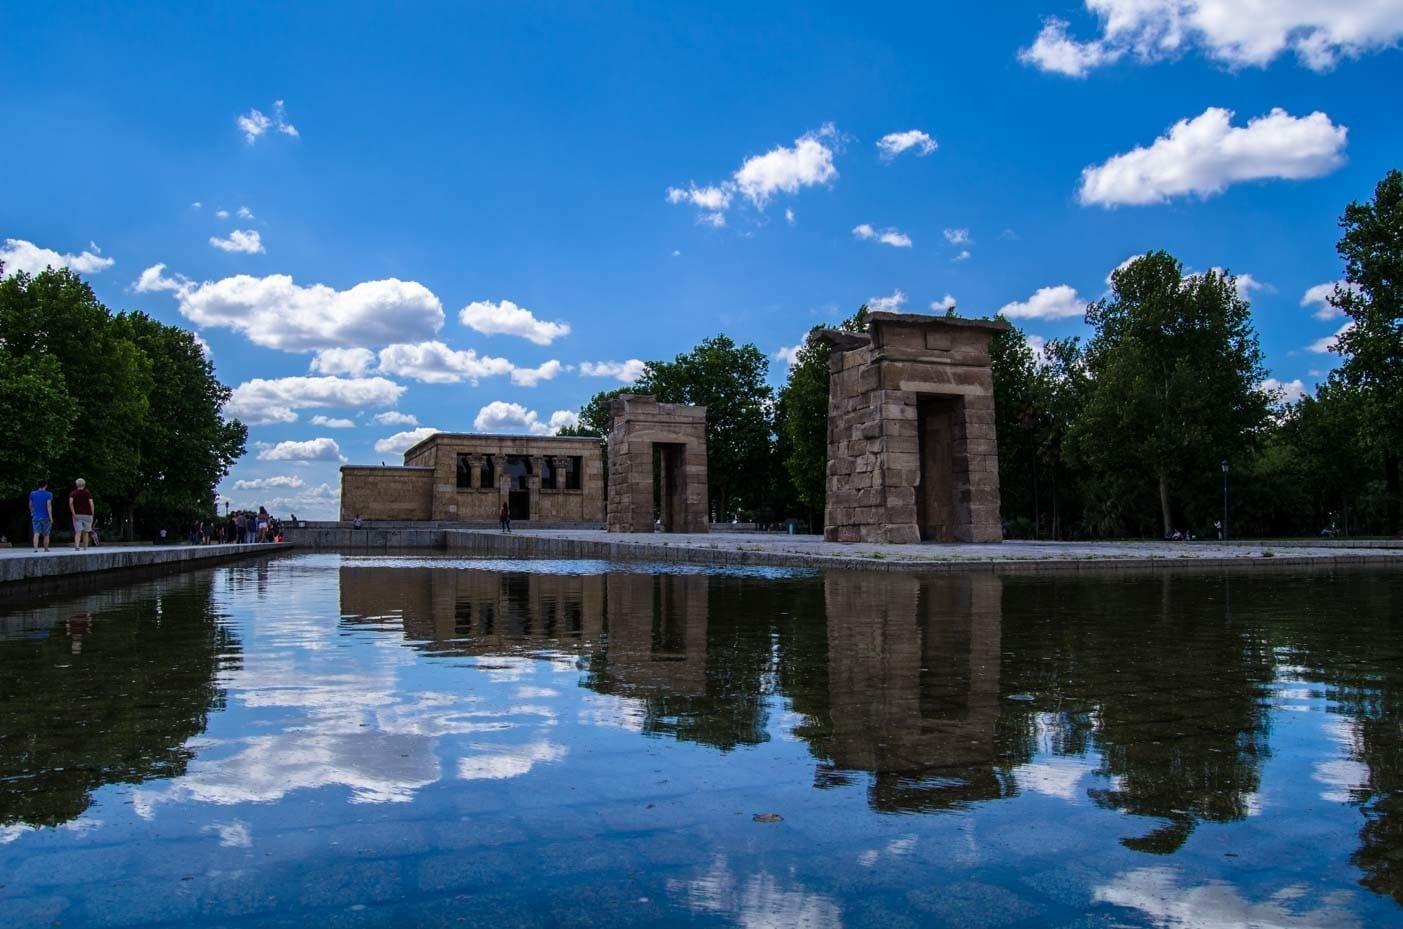 Templo de Debod Madrid egyptian piece